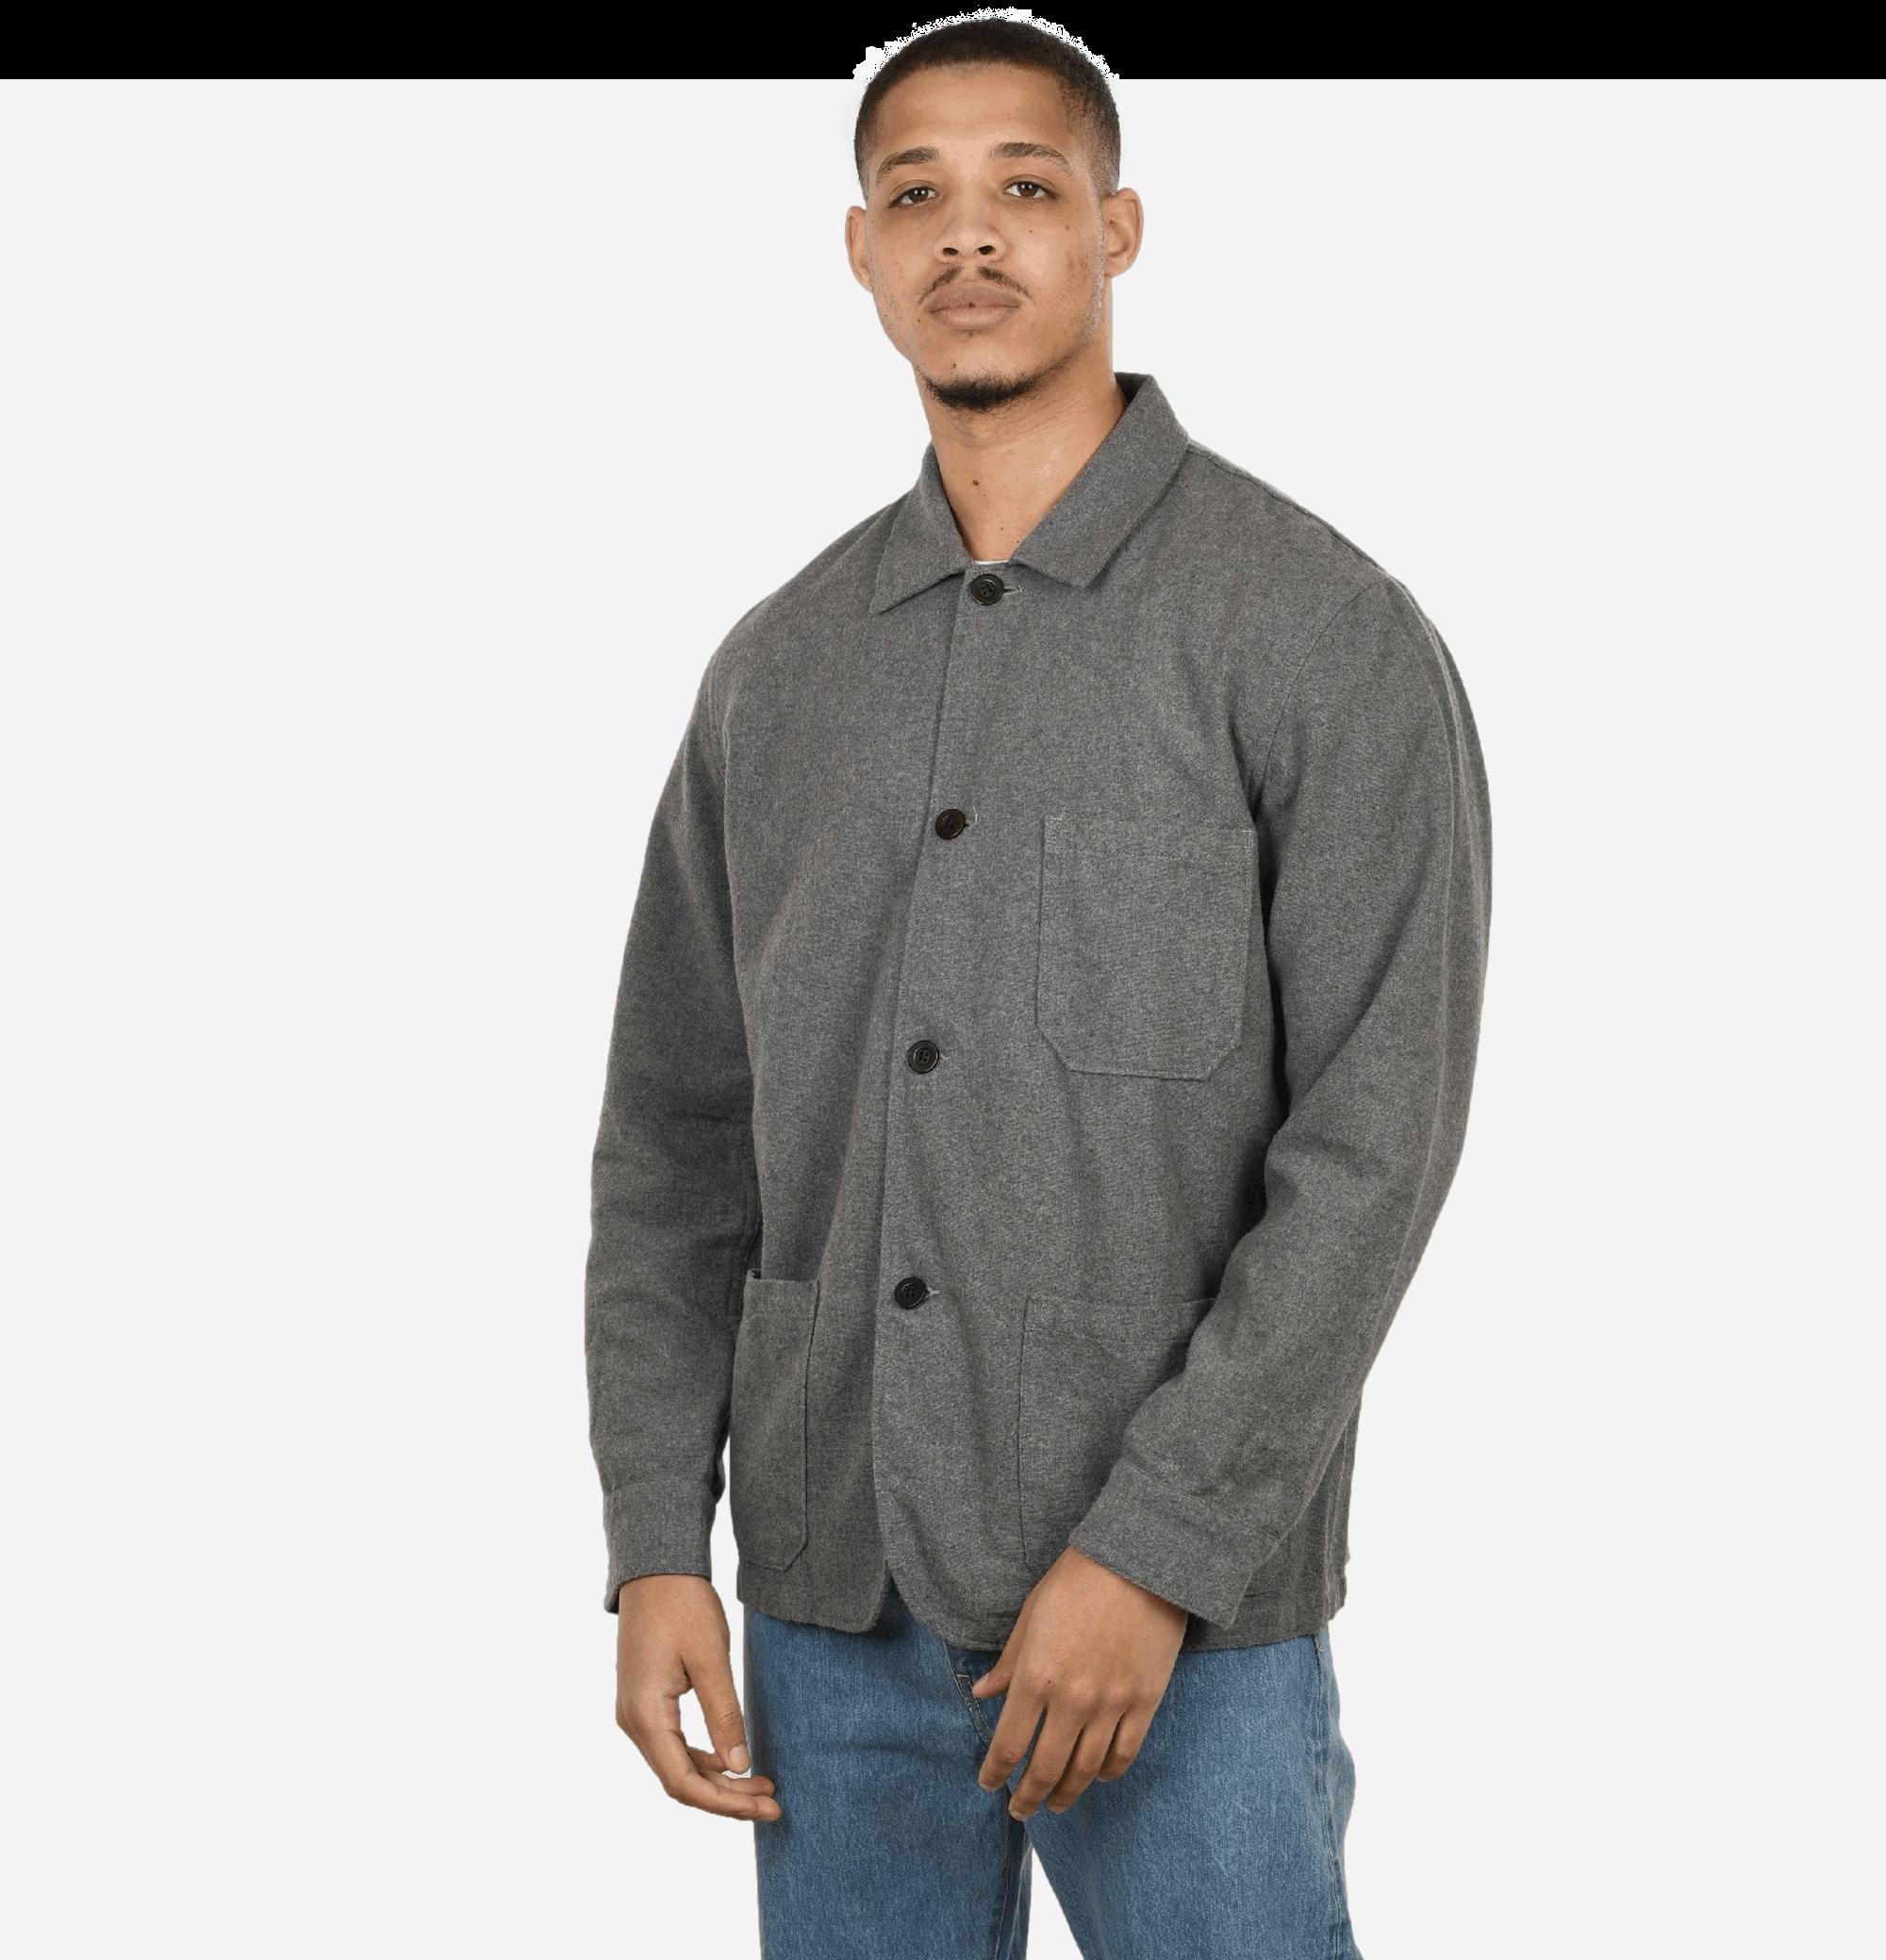 Labura Jacket Flannel Grey